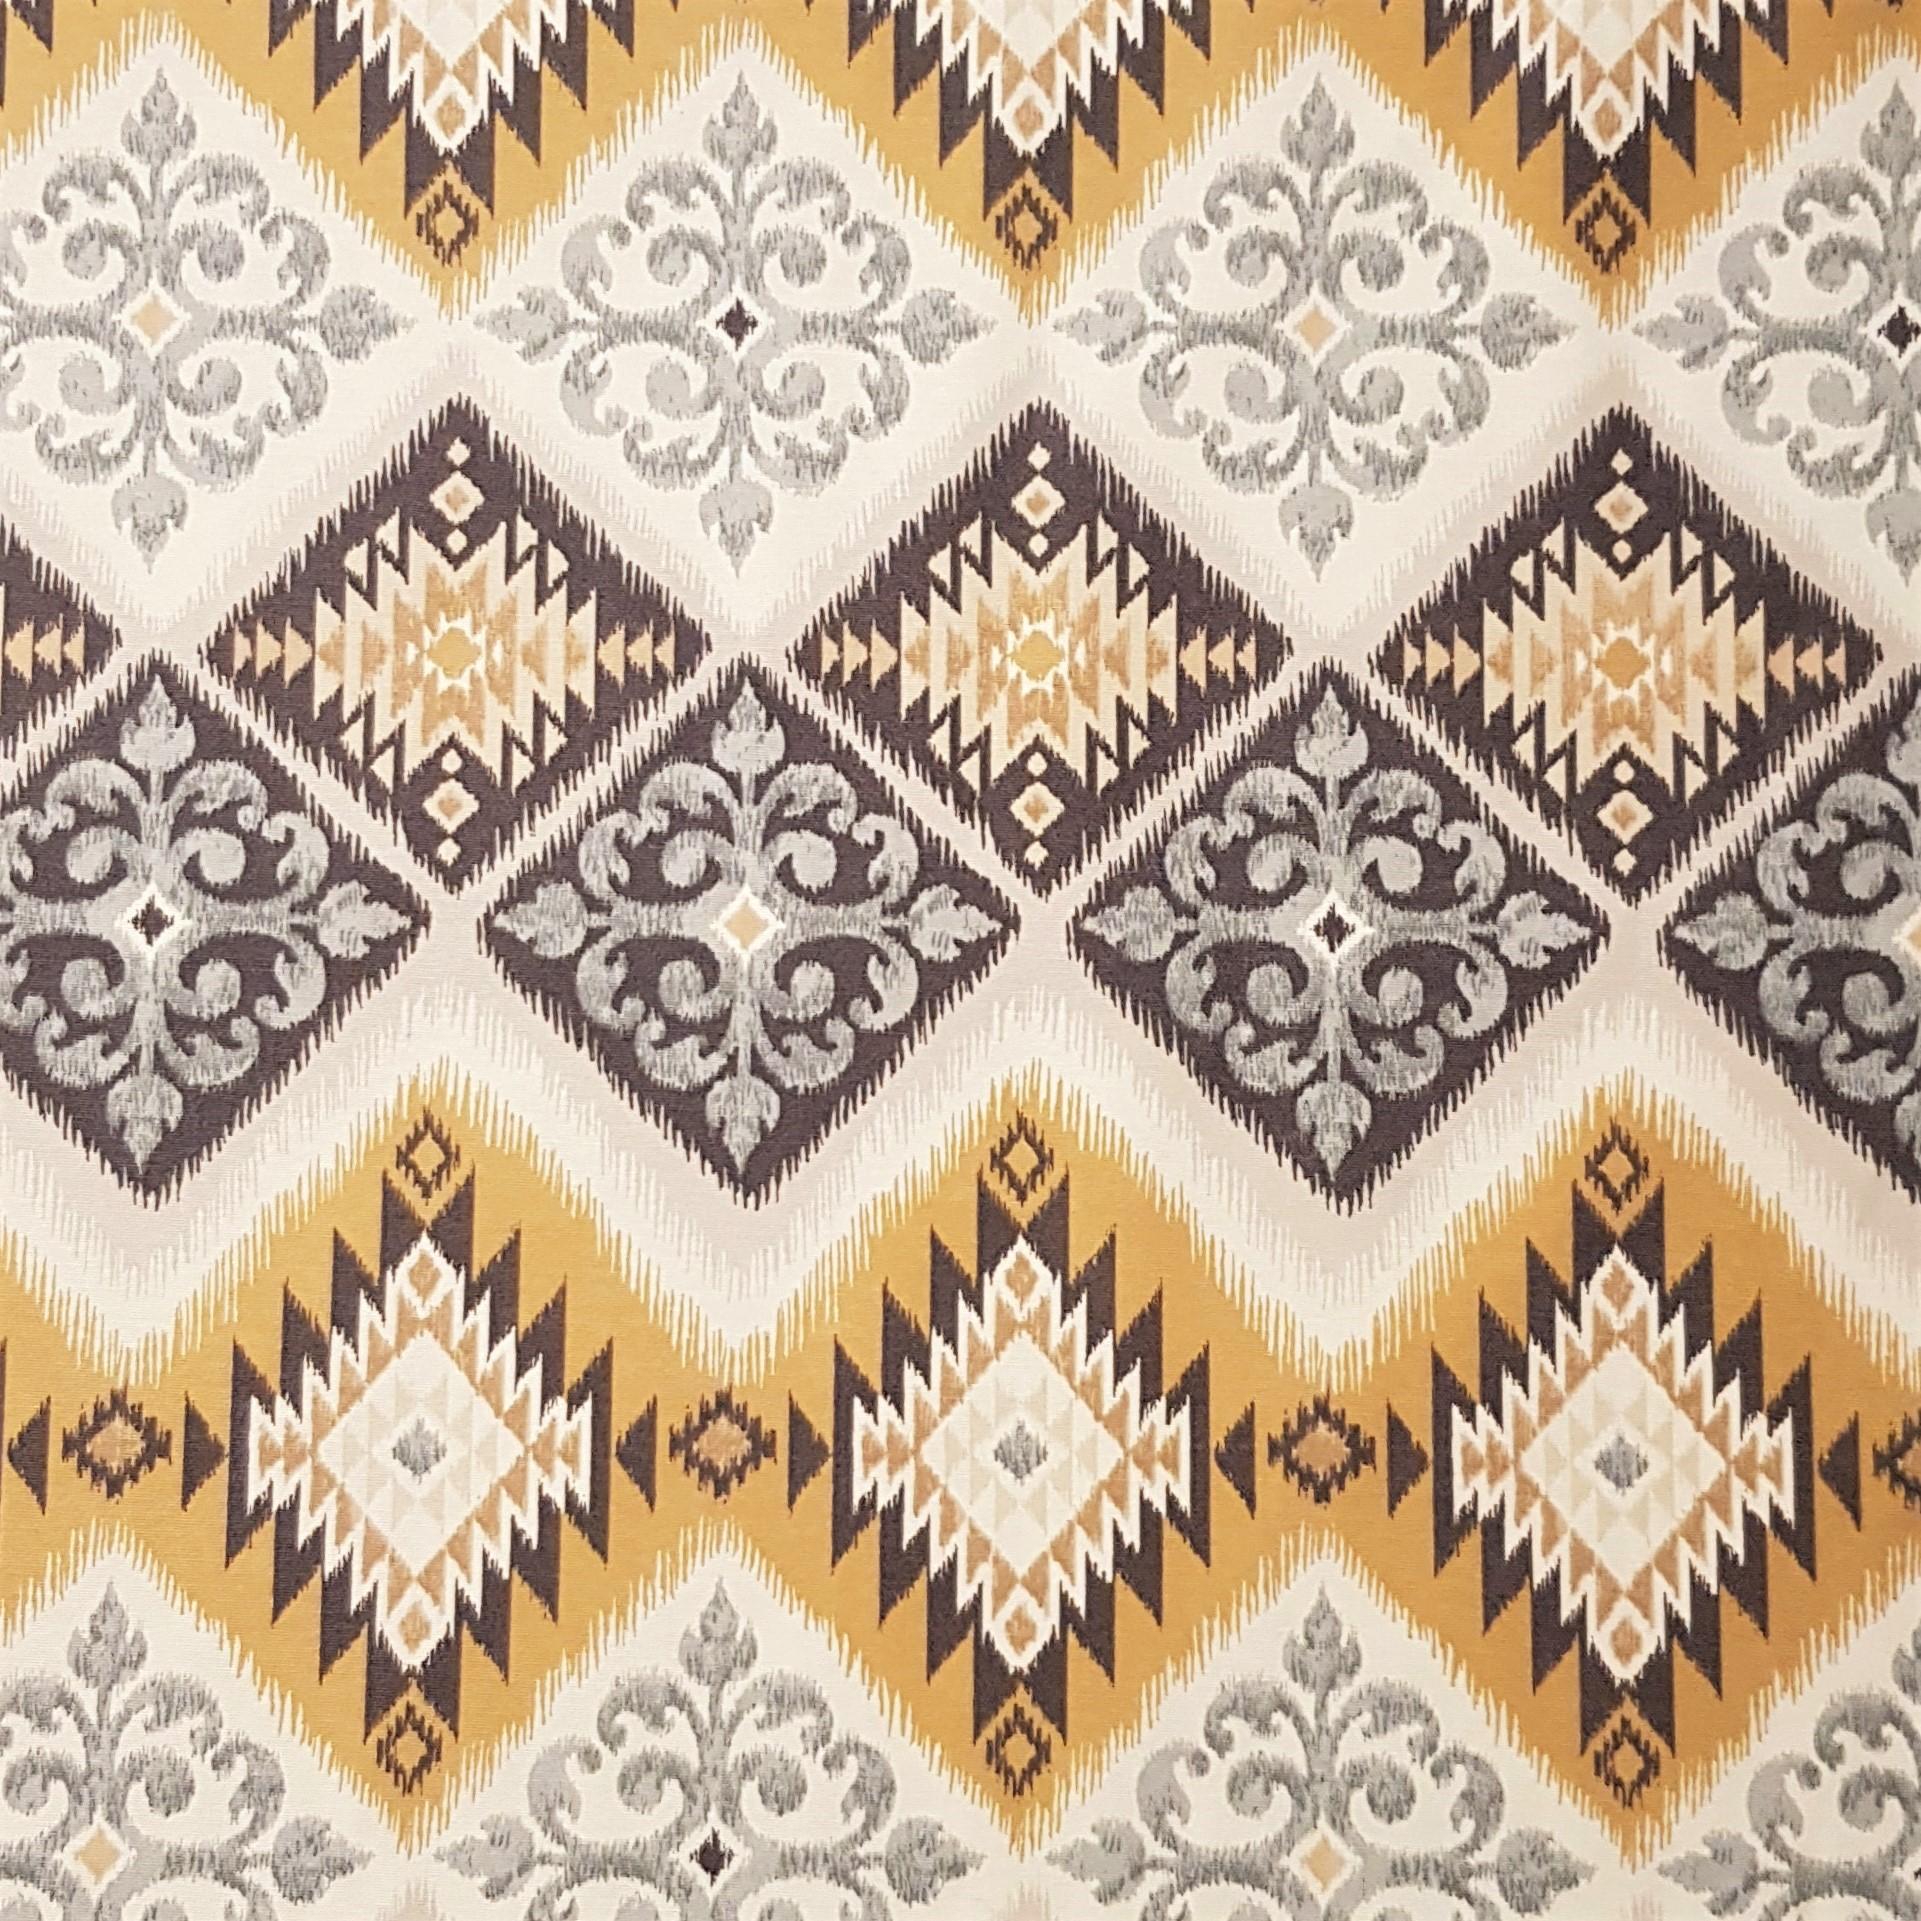 Mantel KILIMGRIS Rectangular 1,8x2,7m [enstockpara envíooretiro]